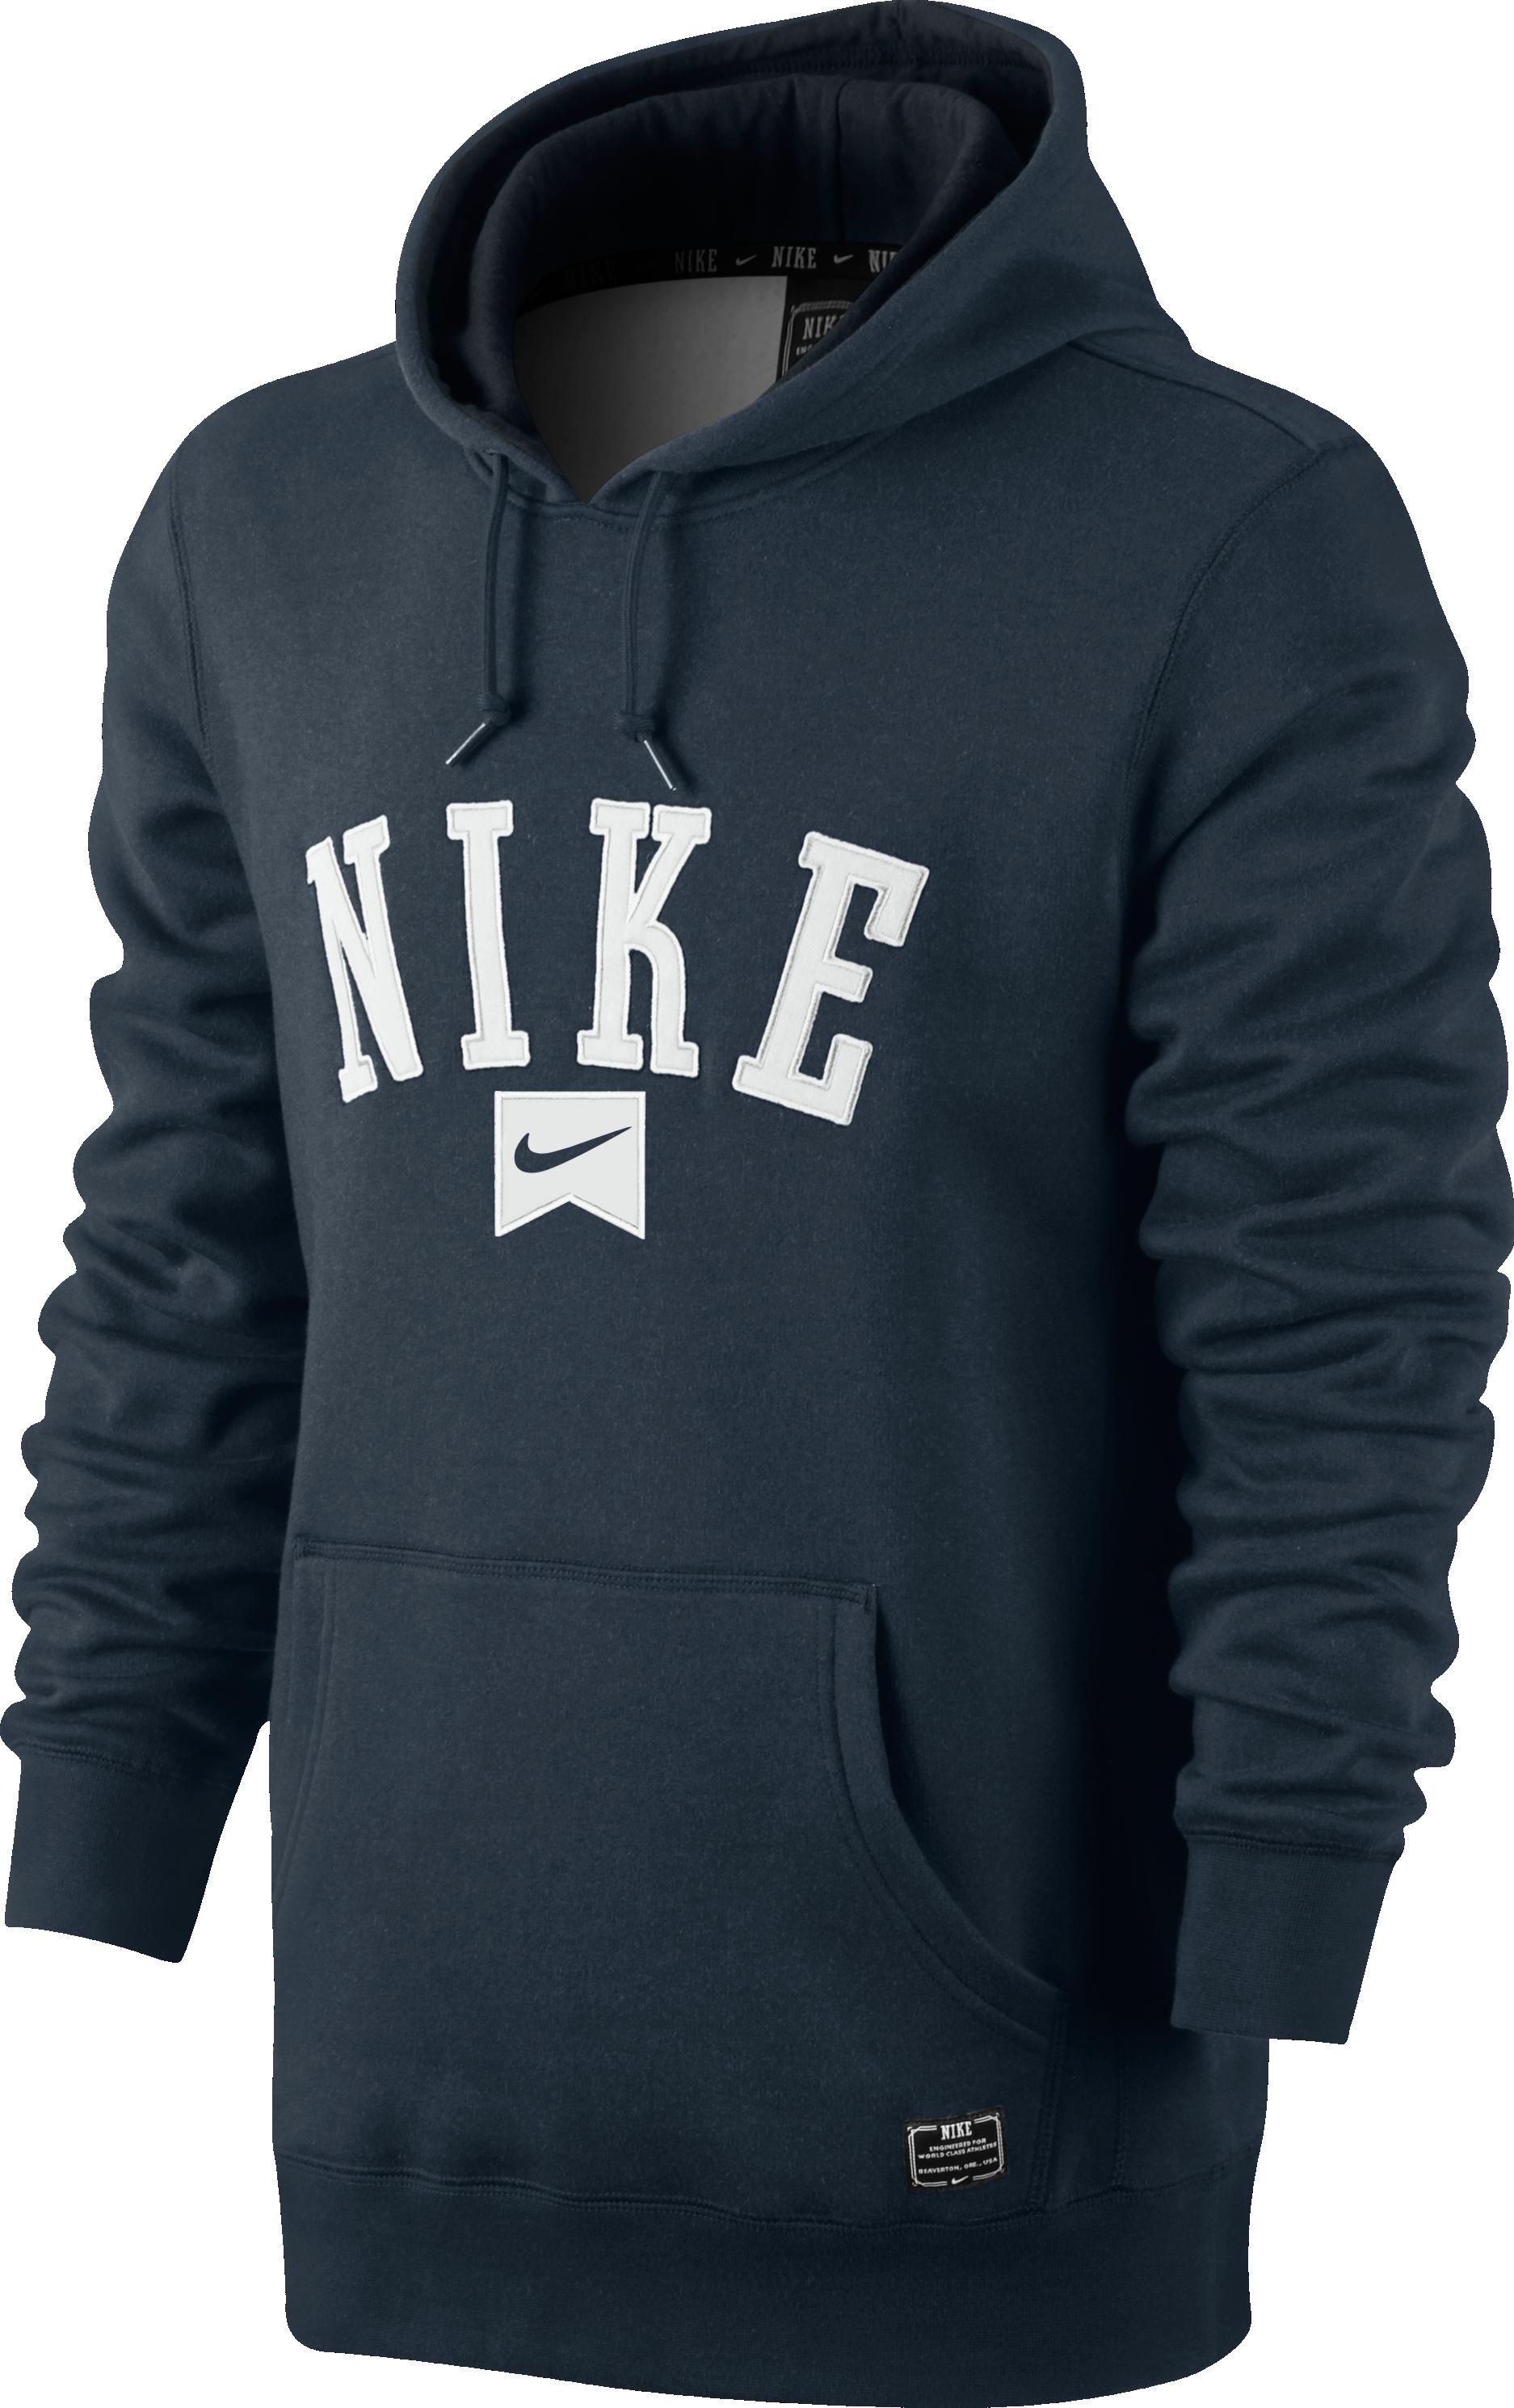 0fb16e62e4801 Sudadera Nike Foundation Ribbon Azul para hombre.  casual  urbanwear  sport   hood